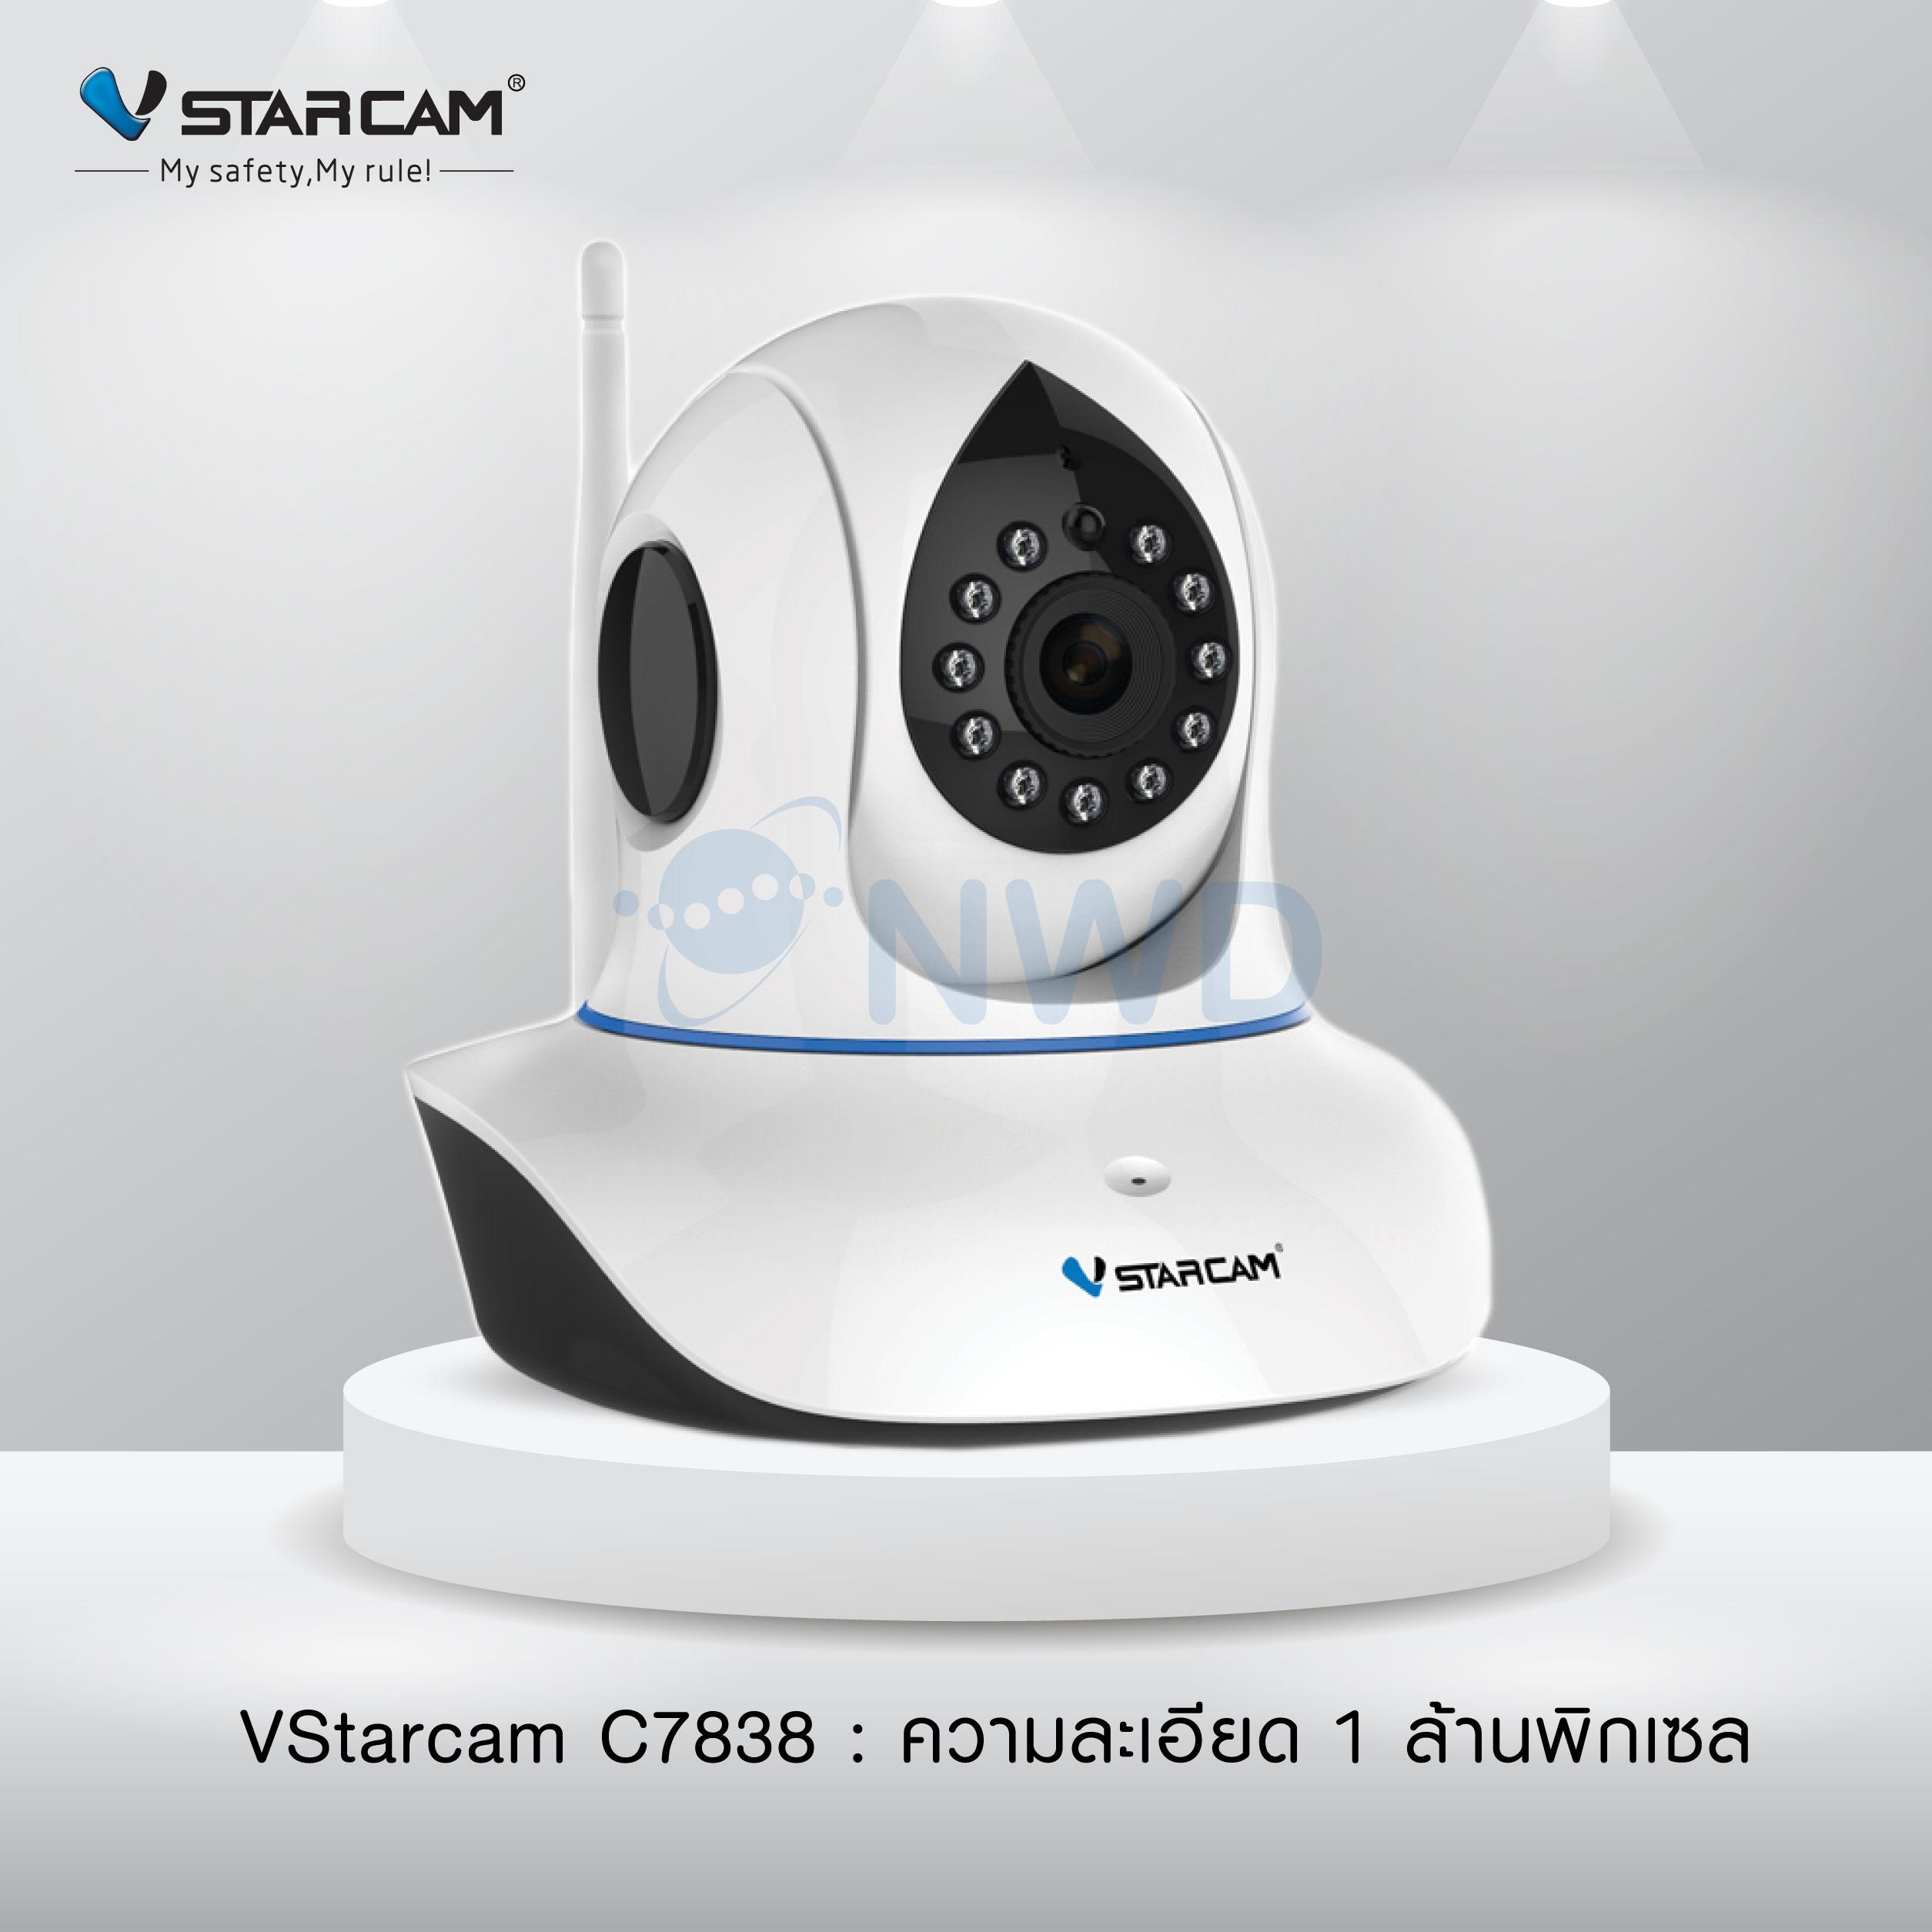 VStarcam C7838